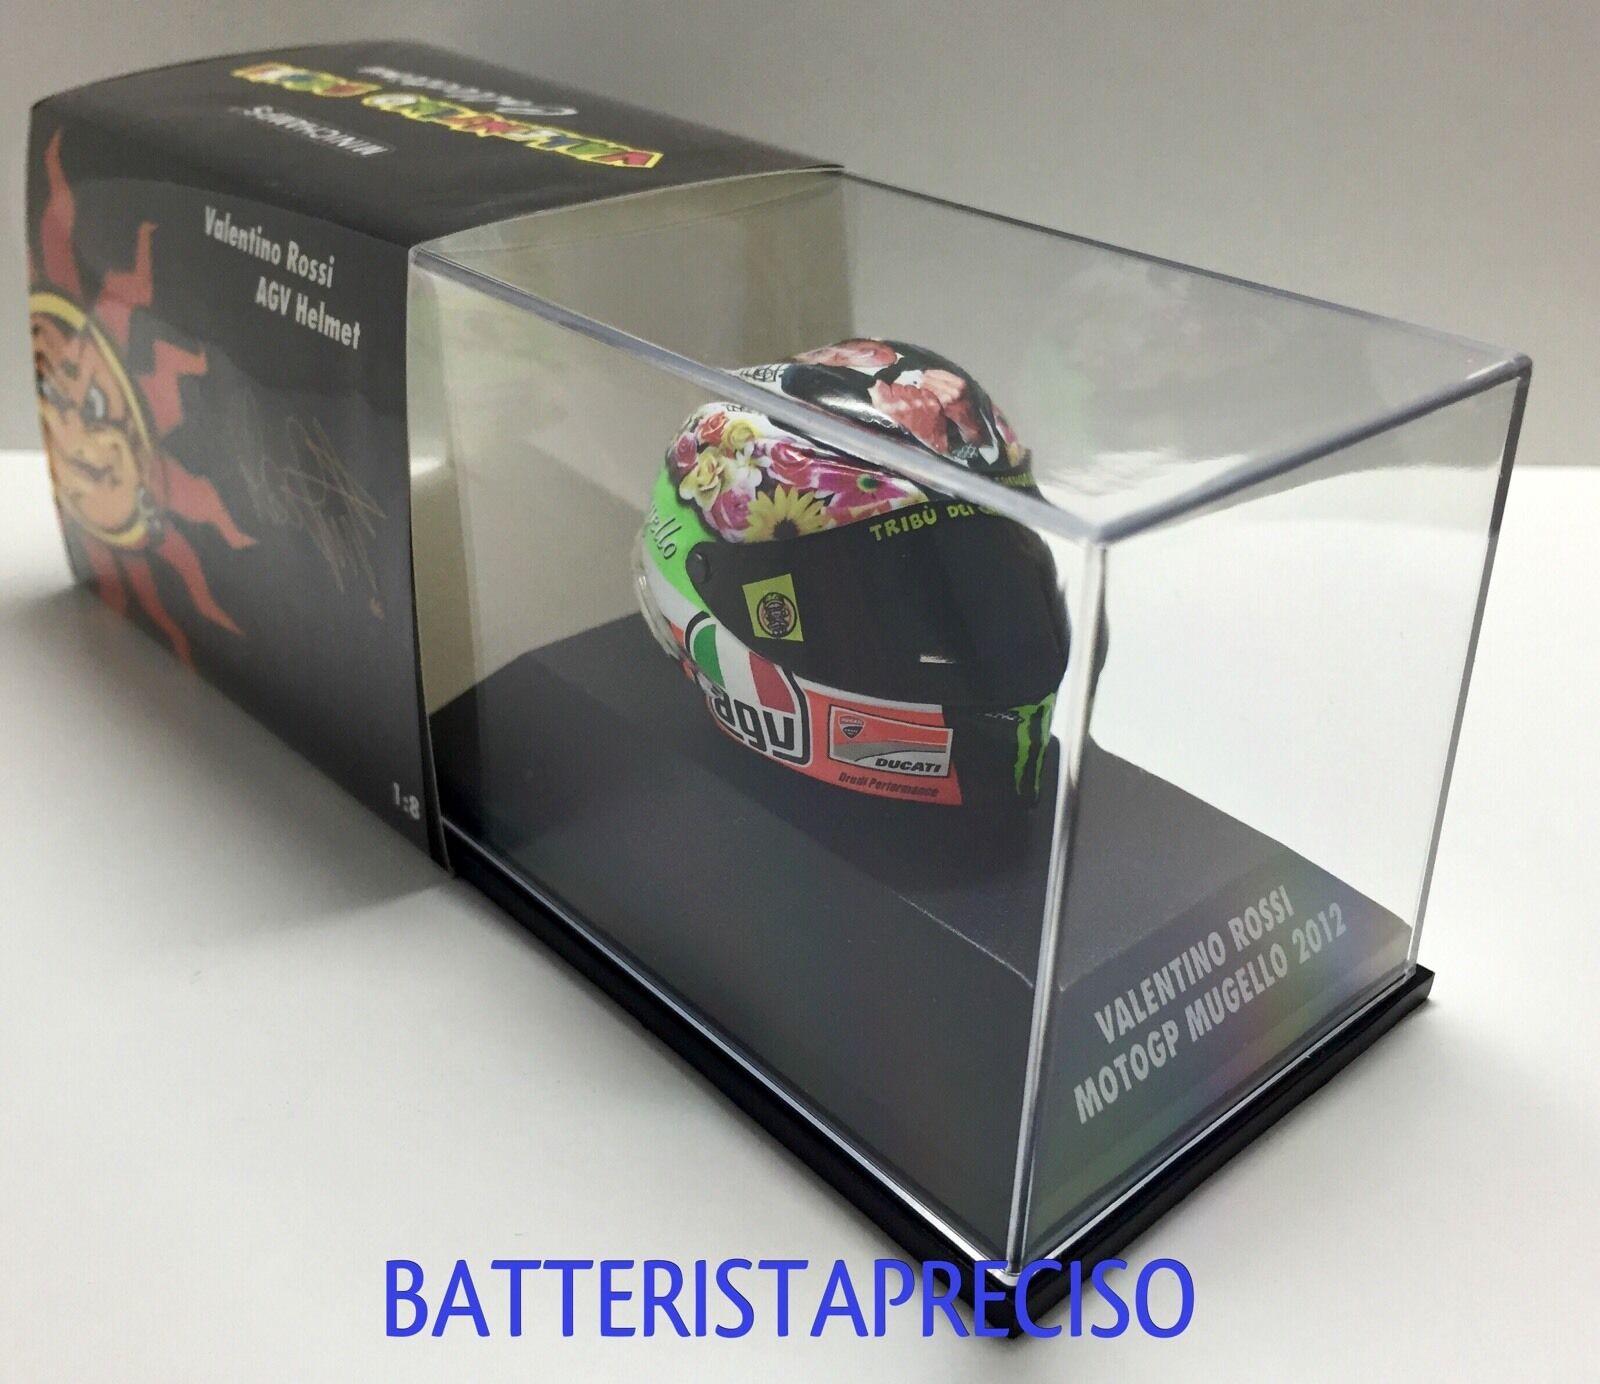 MINICHAMPS VALENTINO ROSSI AGV HELMET HELMET HELMET 1 8 GP MUGELLO 2012 CASCO DUCATI 398120086 6ca01f